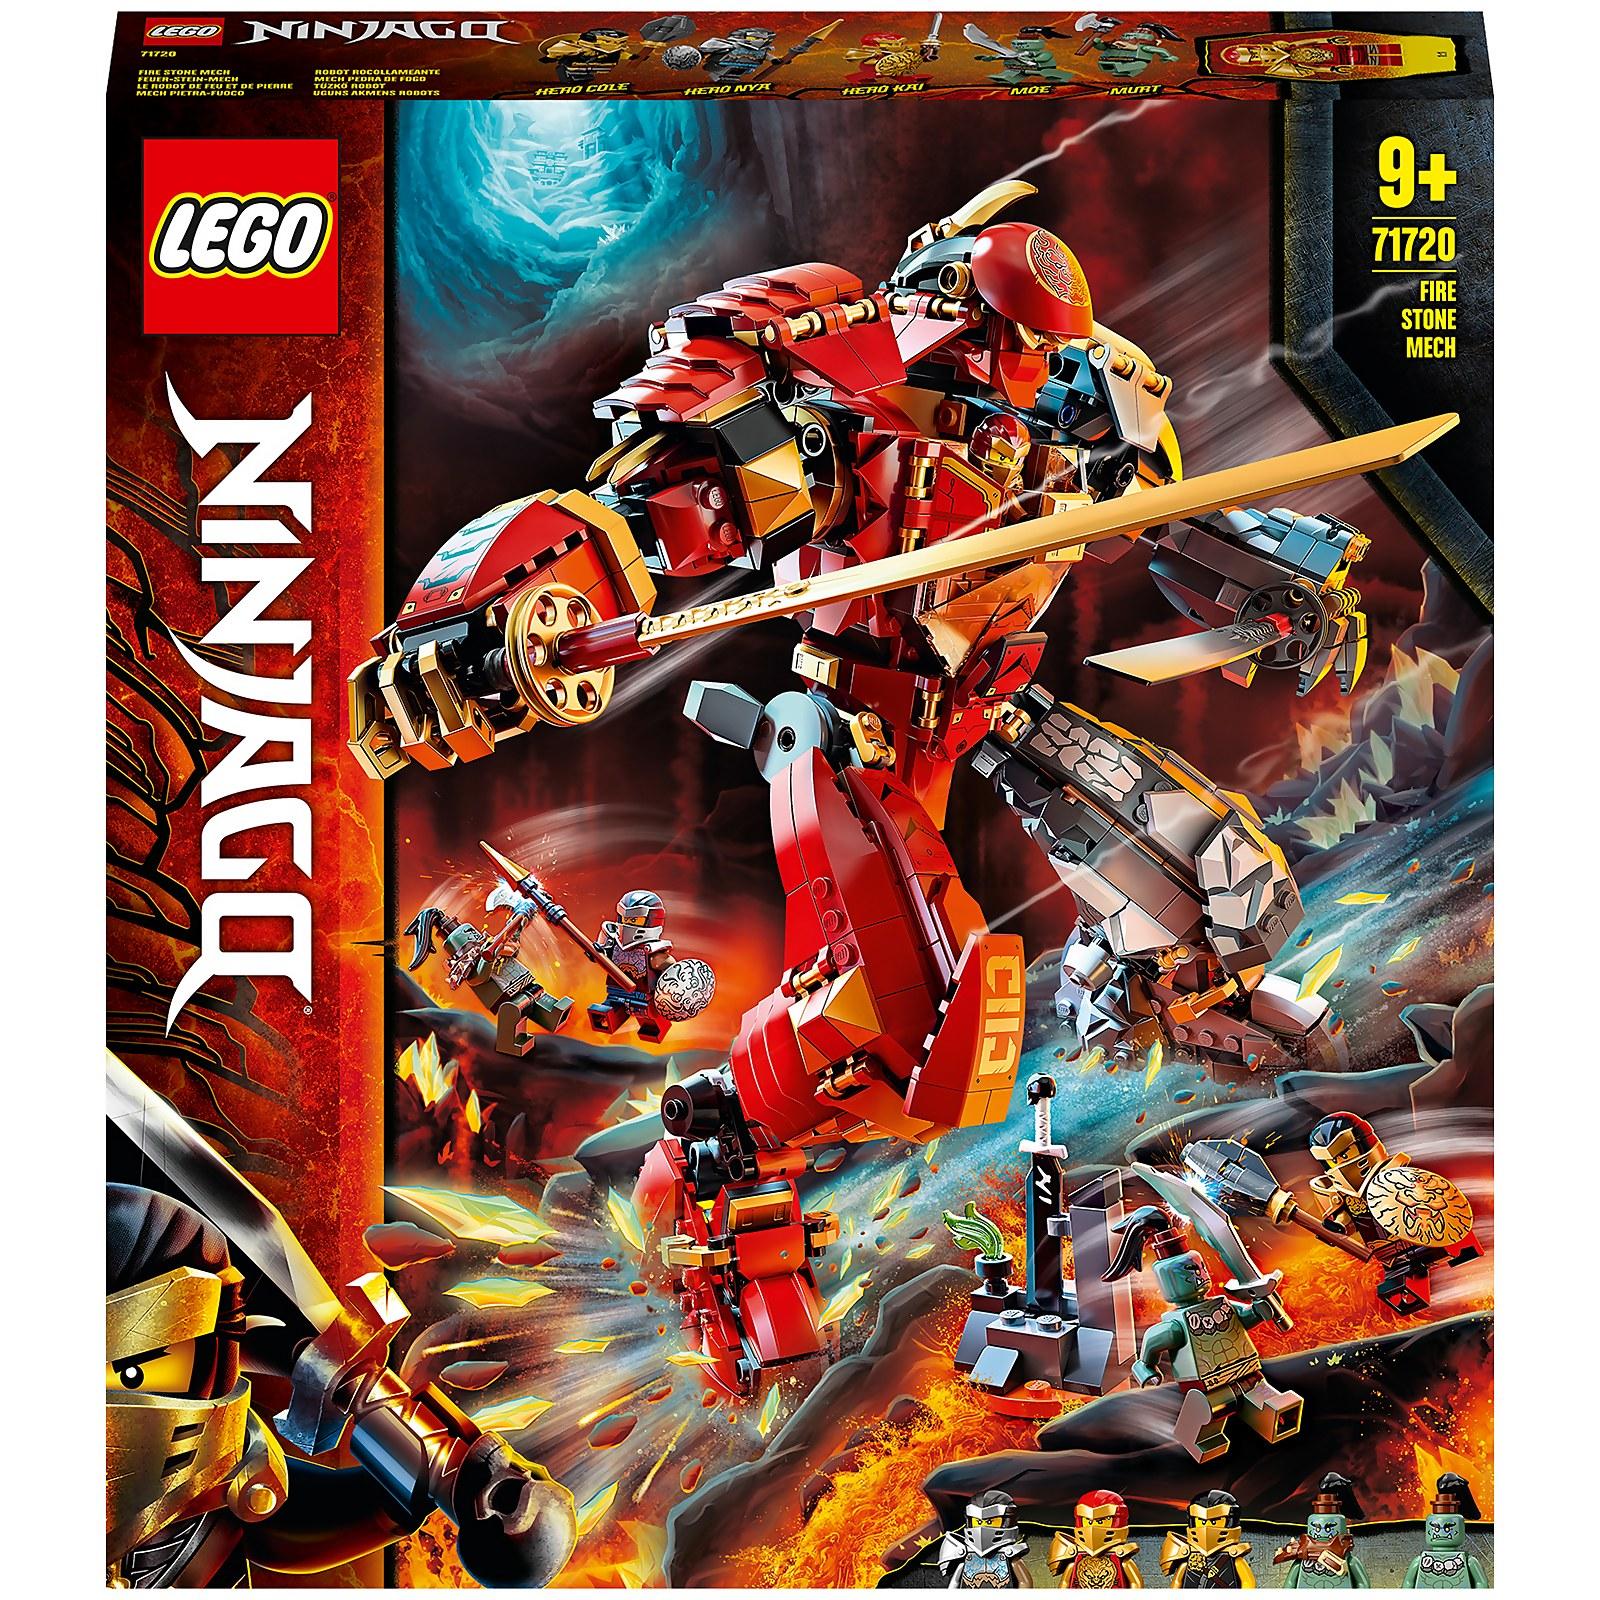 Image of 71720 LEGO® NINJAGO Fire stone Mech